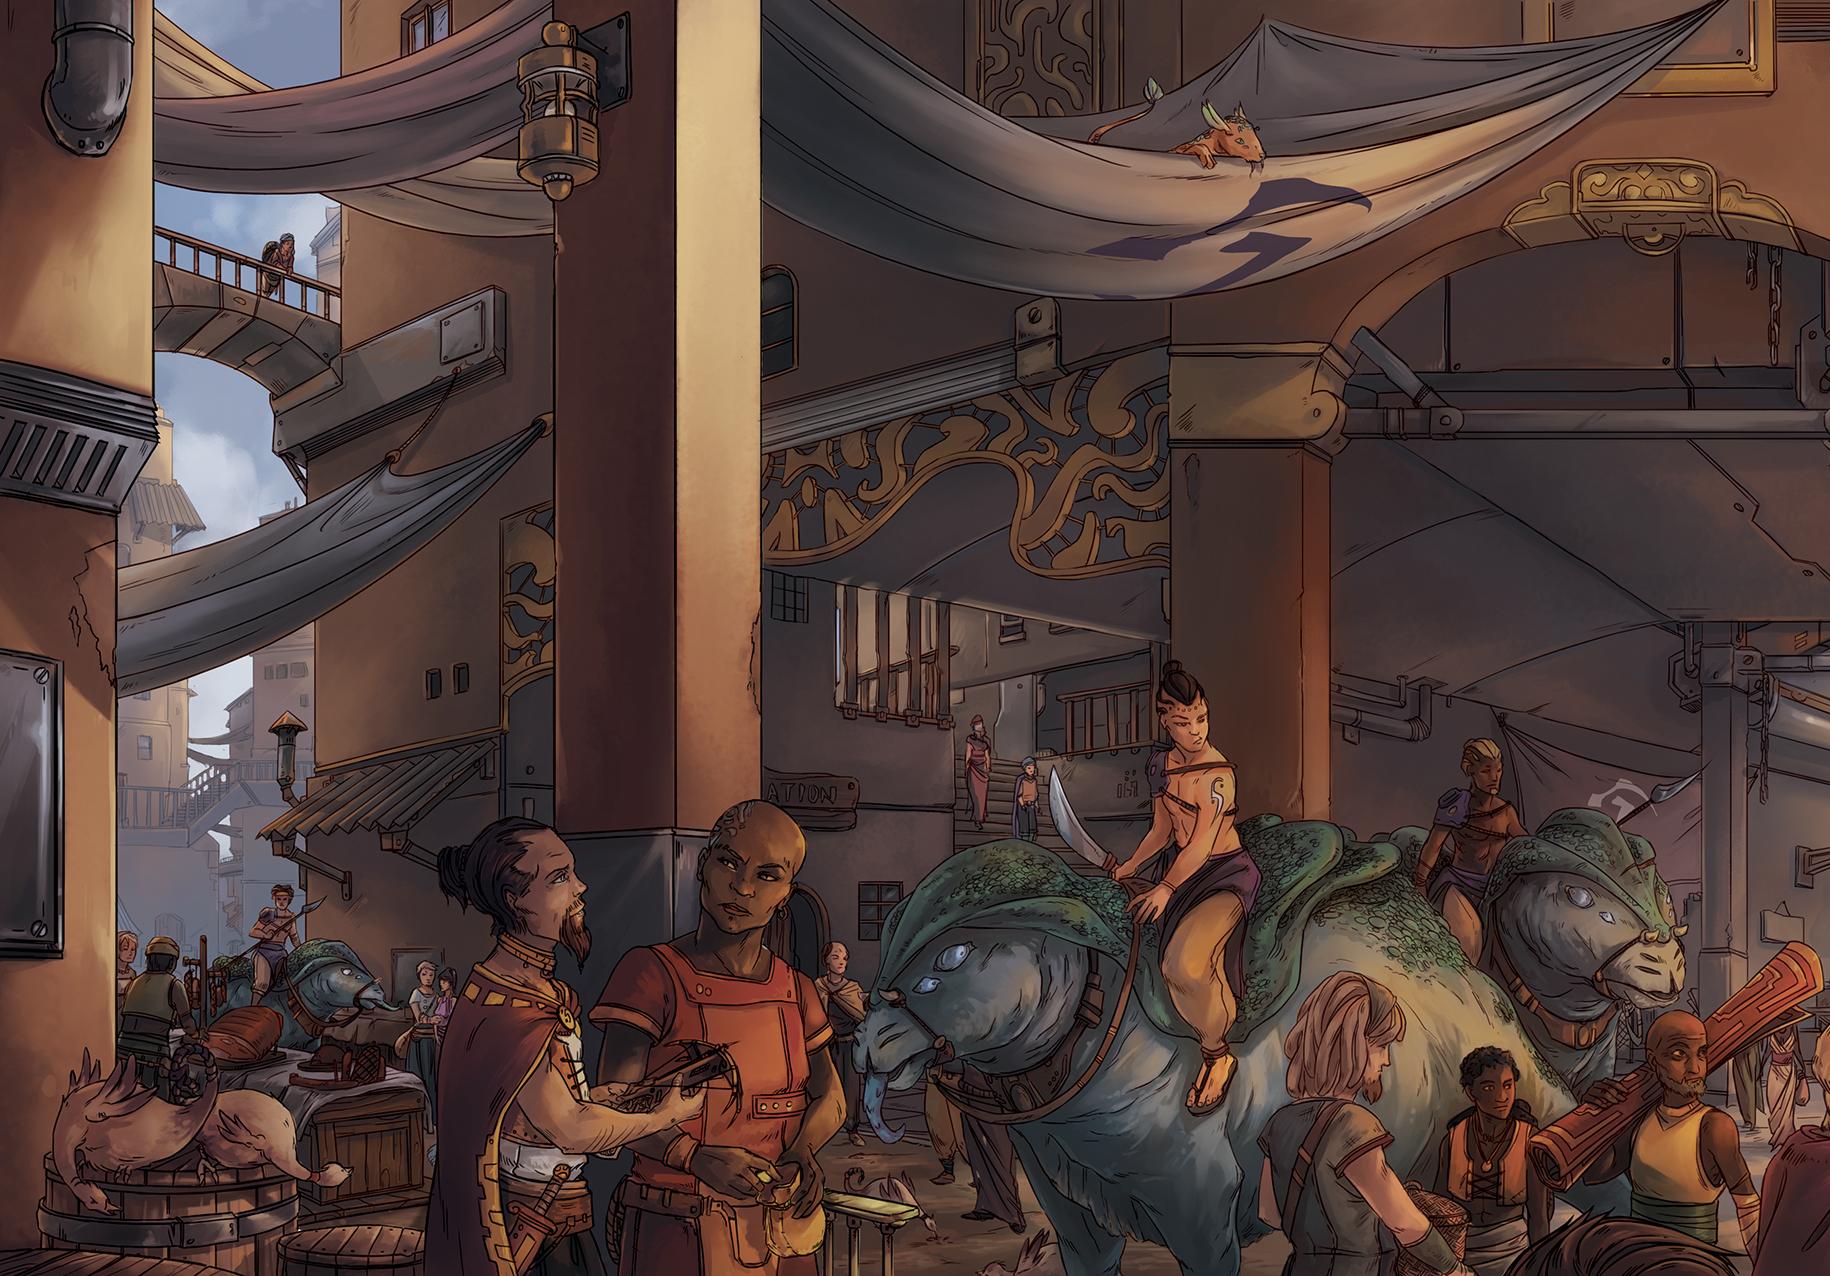 [Souscriptions Ulule] Vivere, Jdr Space Fantasy - Page 2 Step6-1